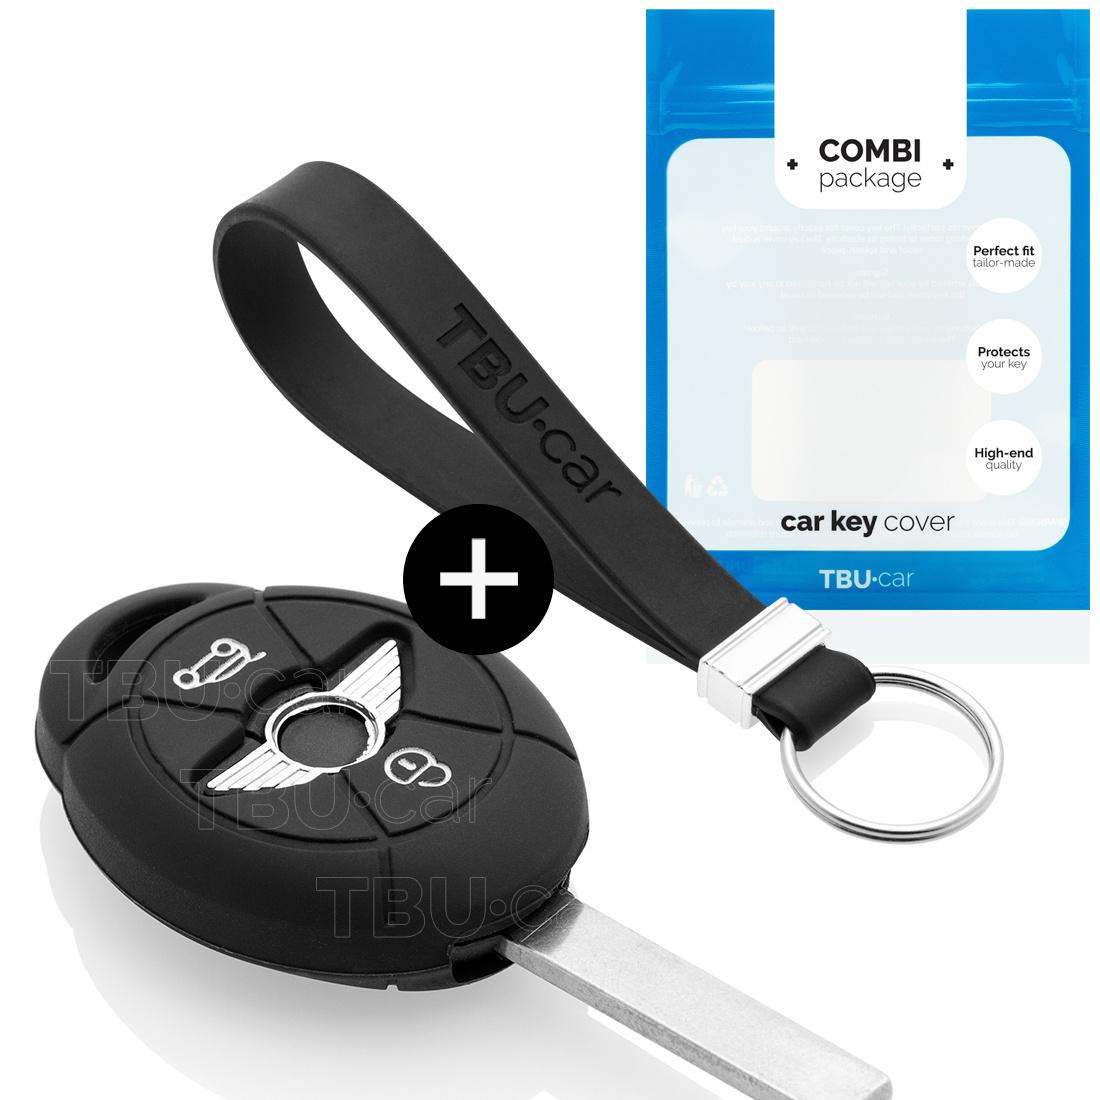 TBU car TBU car Sleutel cover compatibel met Mini - Silicone sleutelhoesje - beschermhoesje autosleutel - Zwart